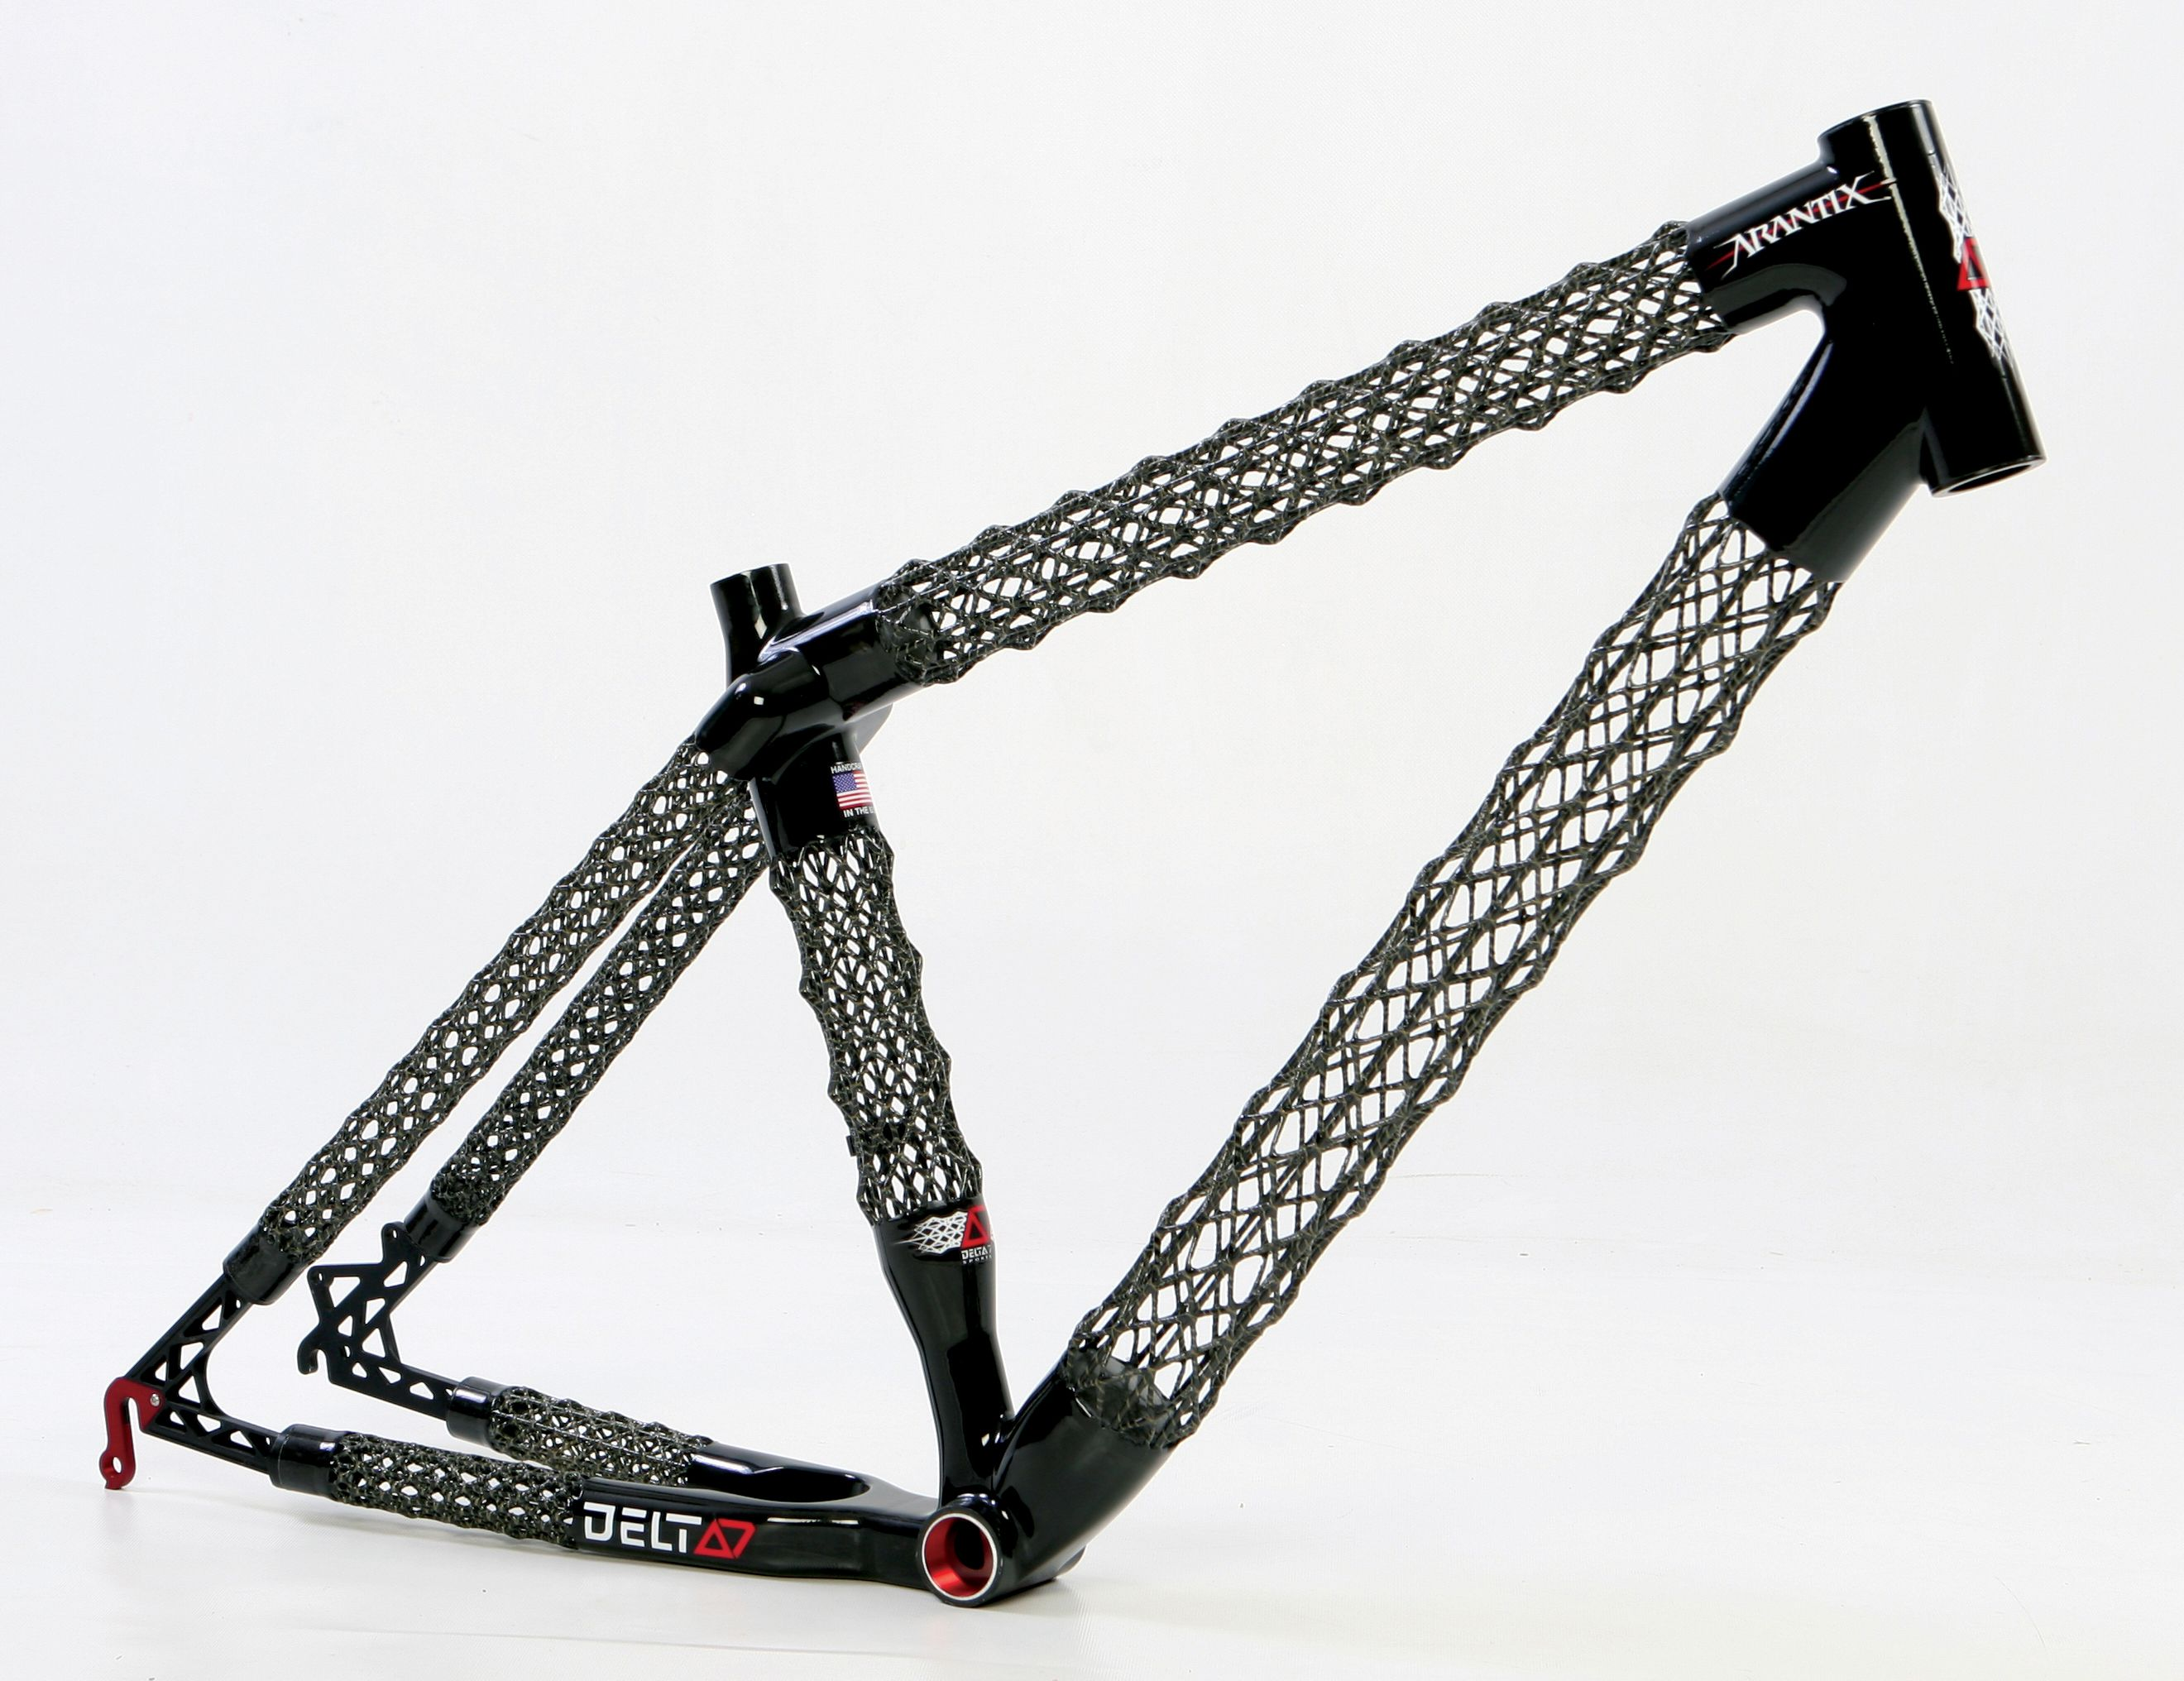 delta-7-arantix-frame.jpg (2640×2032) | Bicycle Design | Pinterest ...